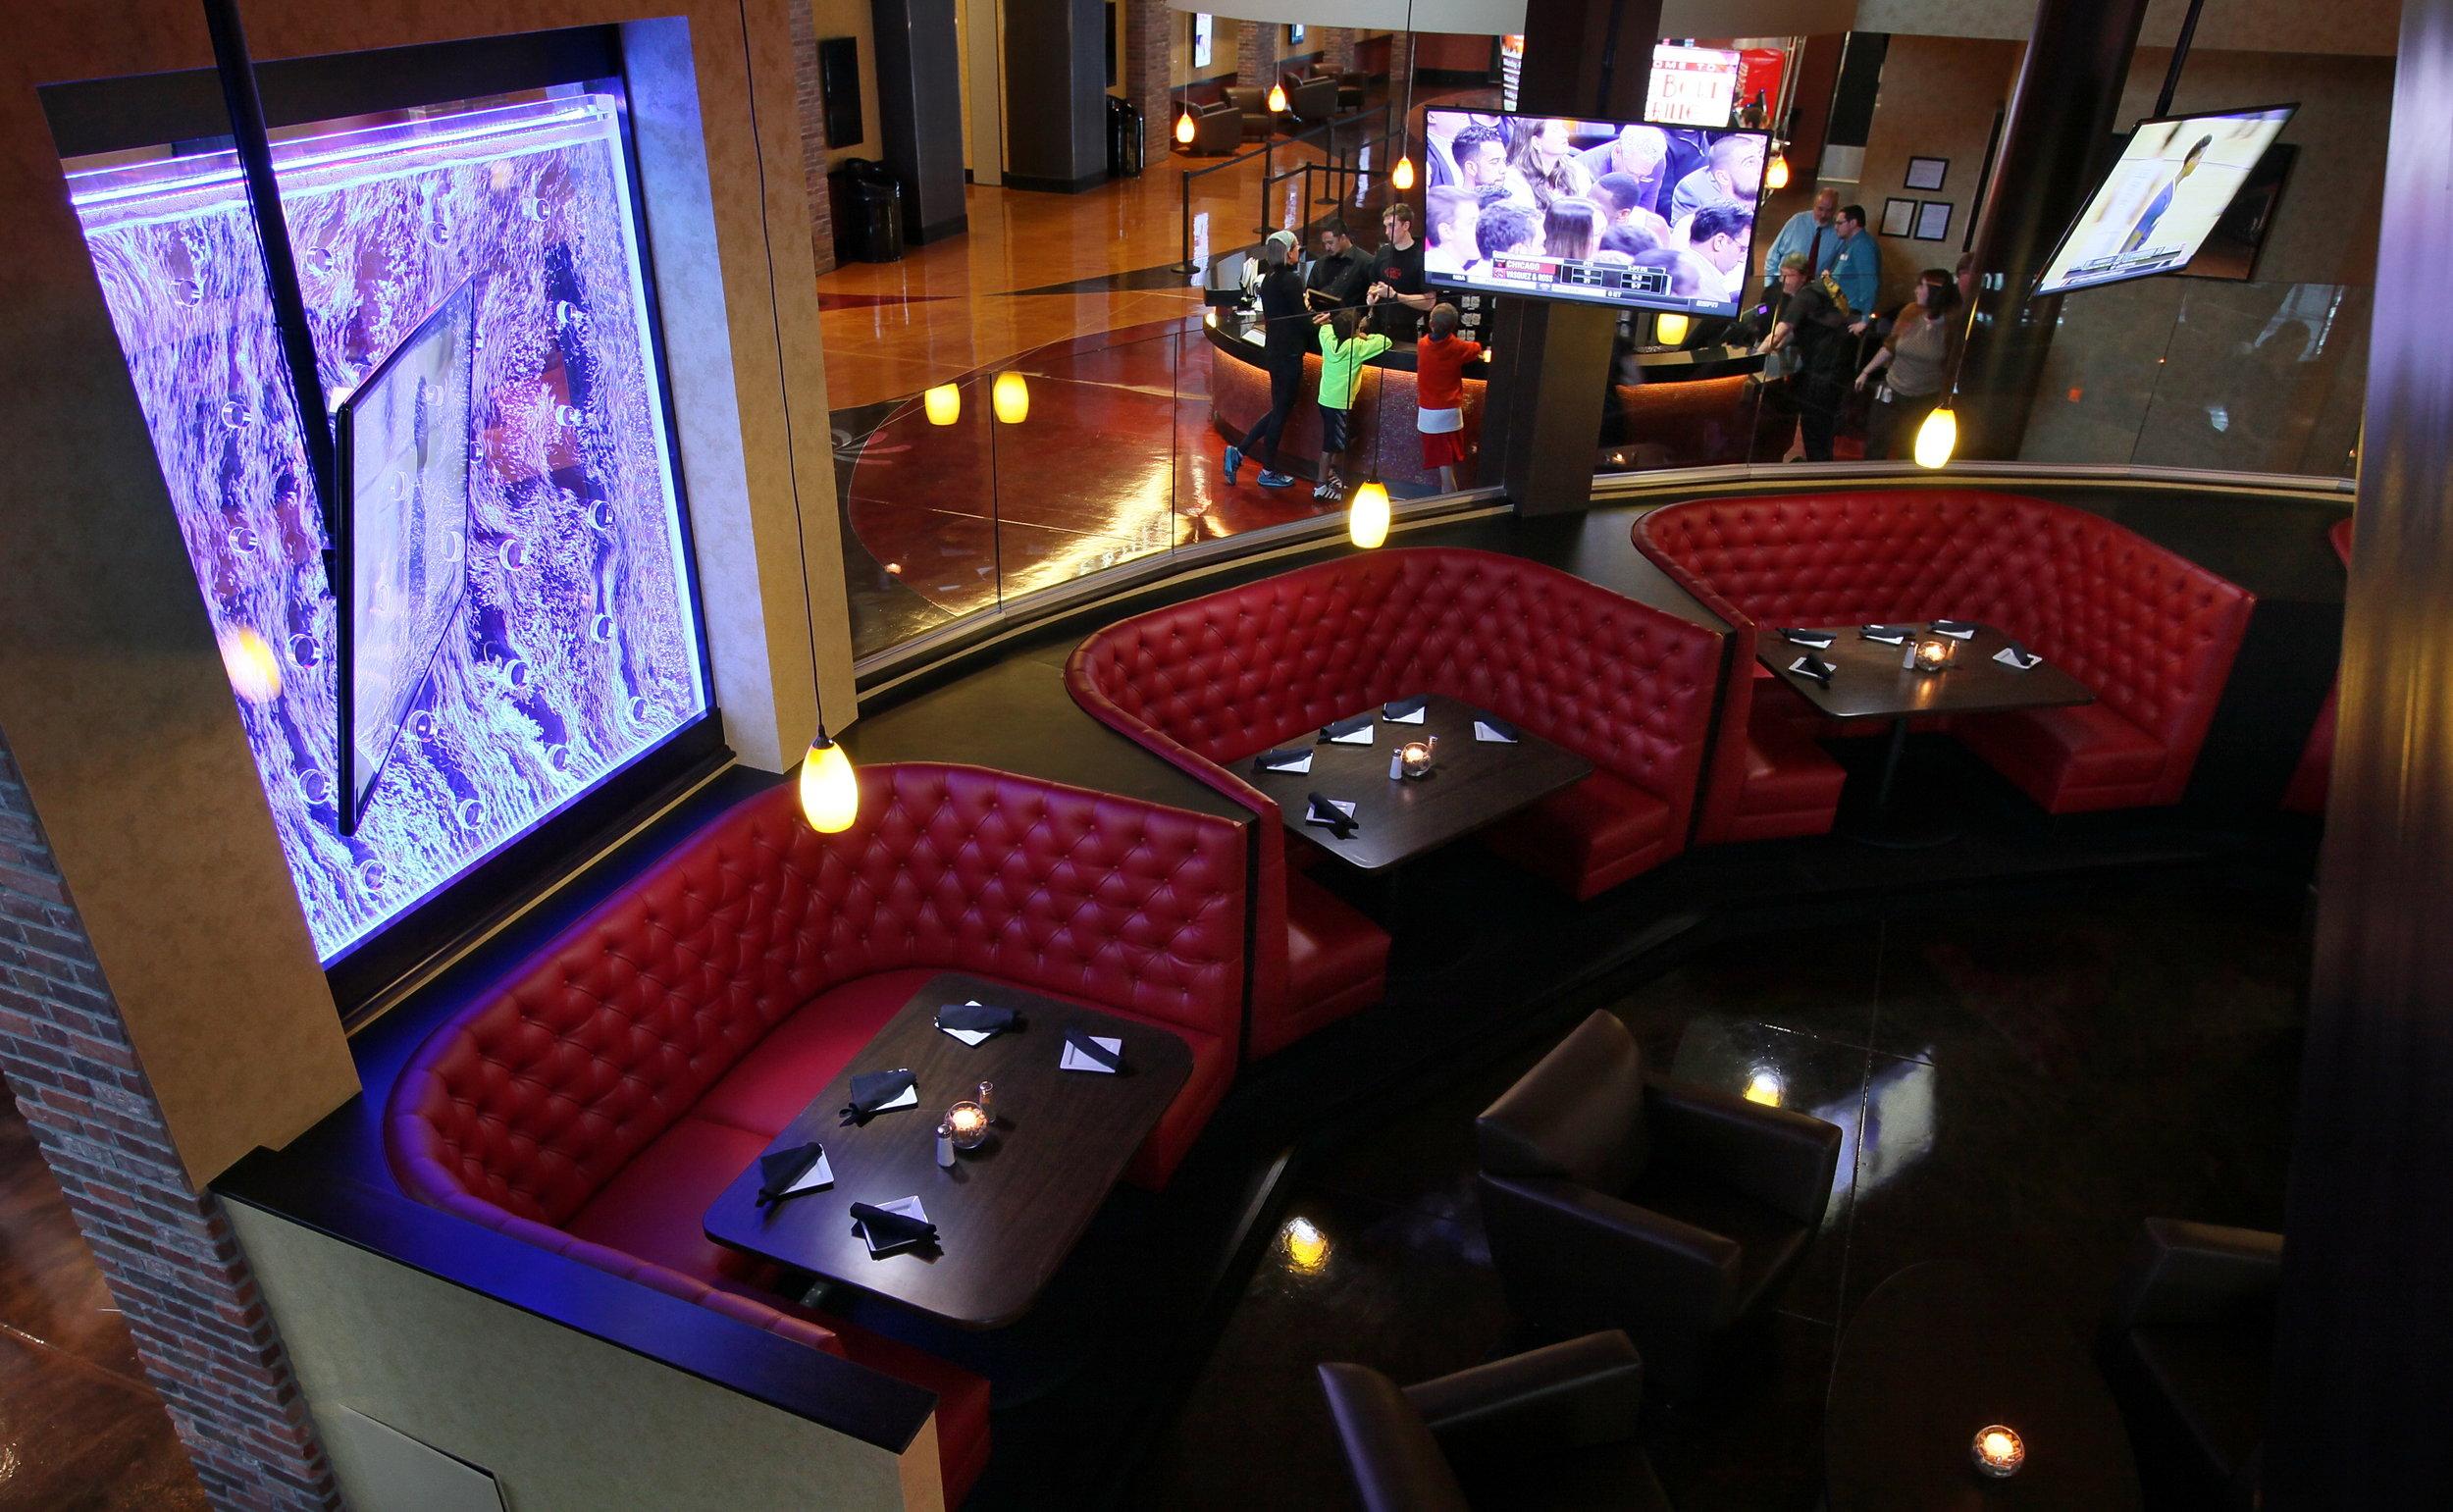 ADW-Entertainment-CineBowl-Grille-Blacksburg-VA-7.jpg